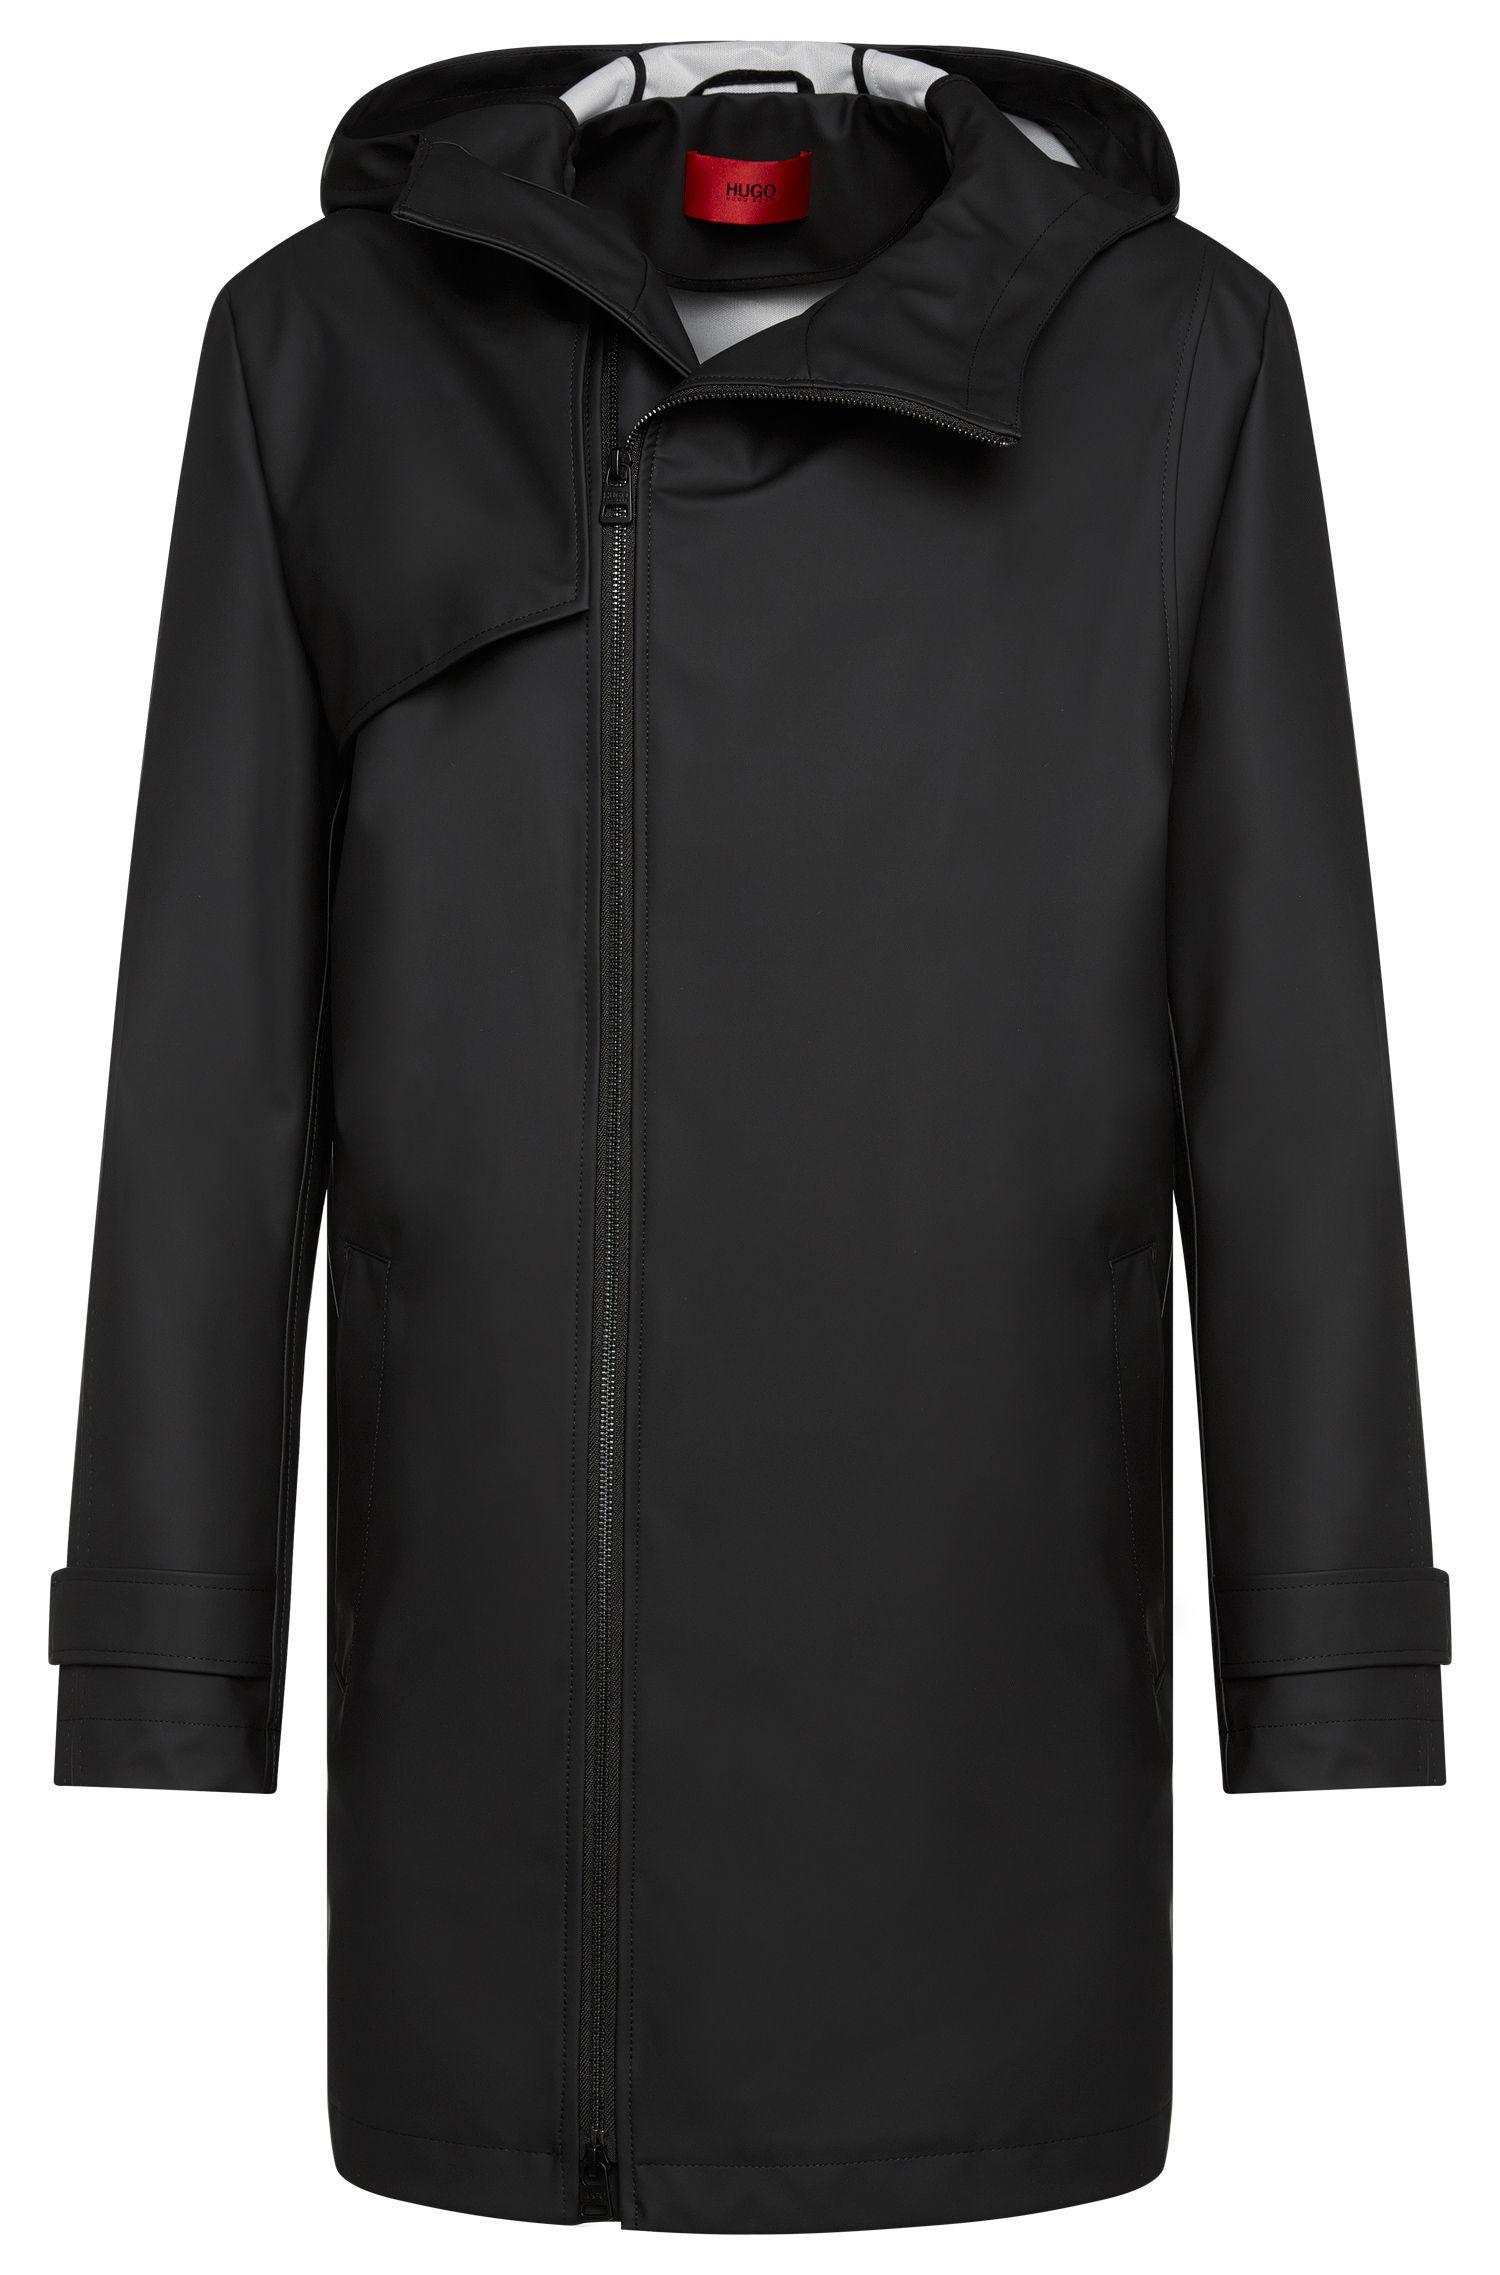 Water Repellent Hooded Rain Coat | Menoz